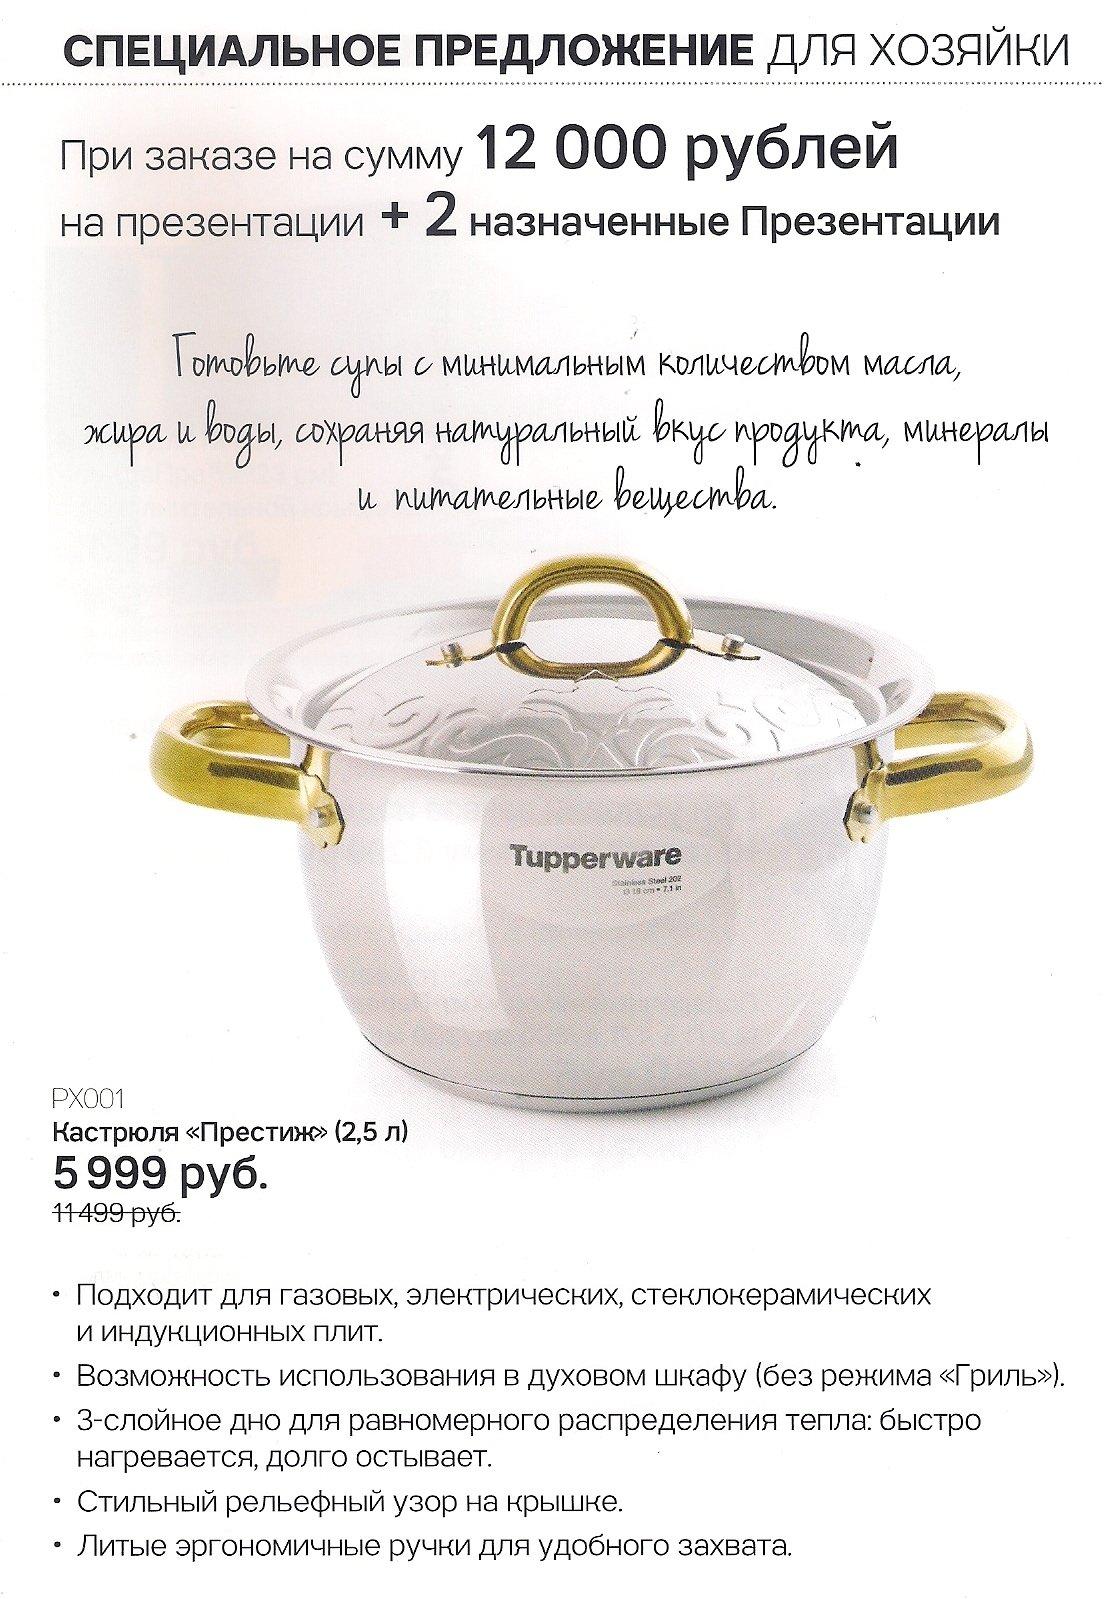 http://tupperware-online.ru/images/upload/7g.jpg